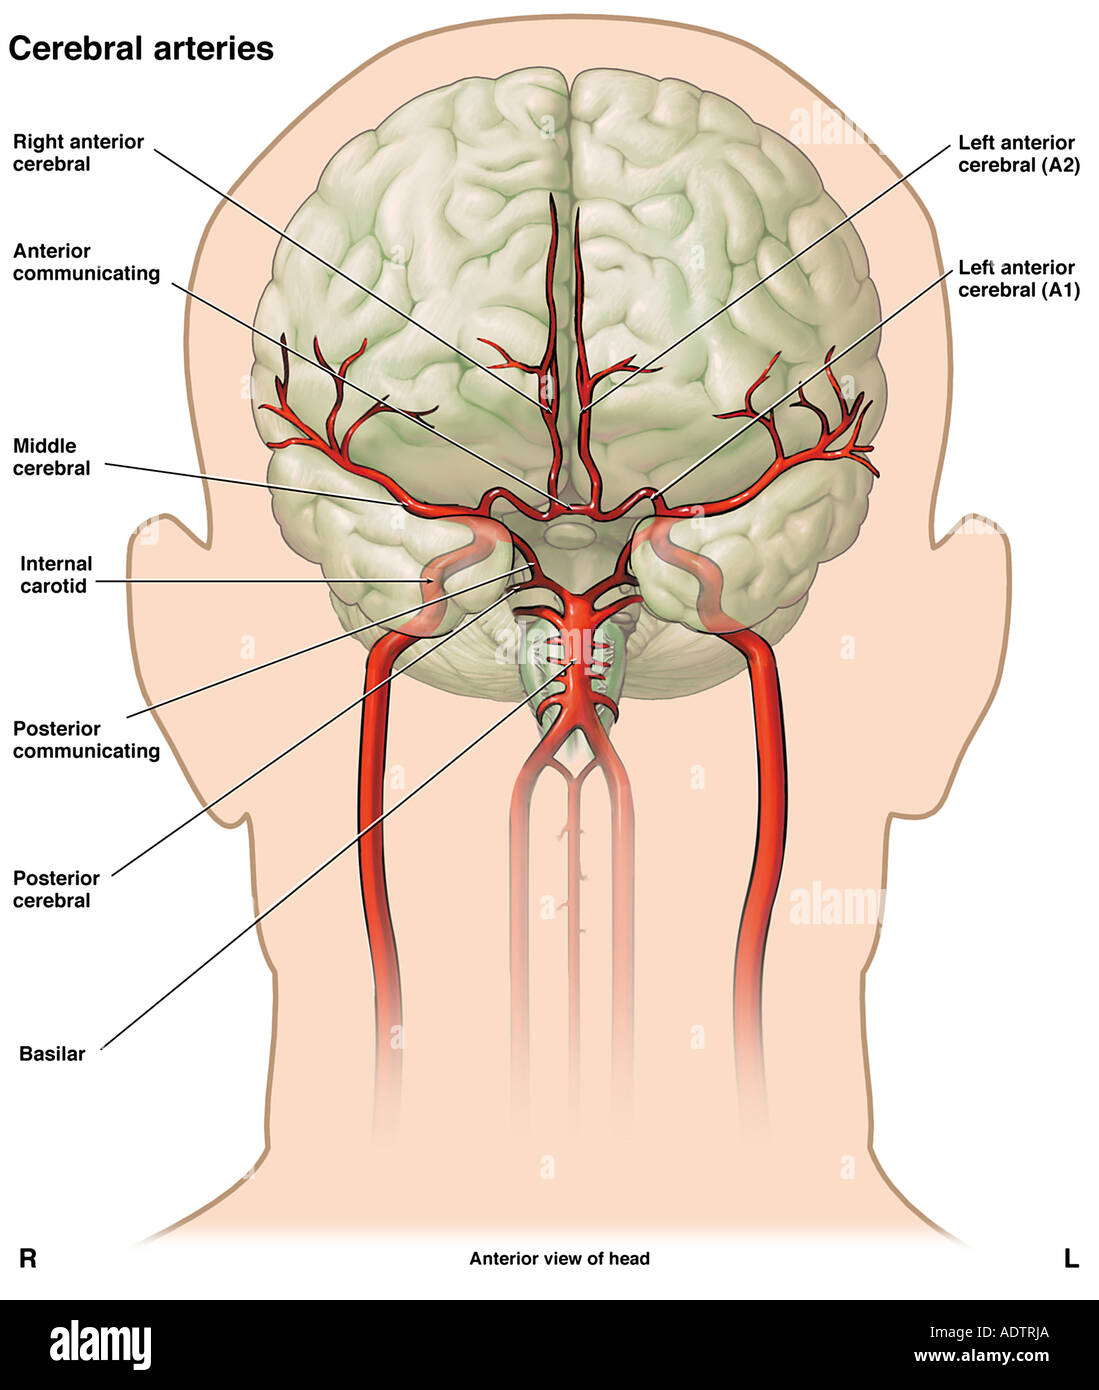 Anatomy of the Cerebral Vasculature Stock Photo: 7710057 - Alamy